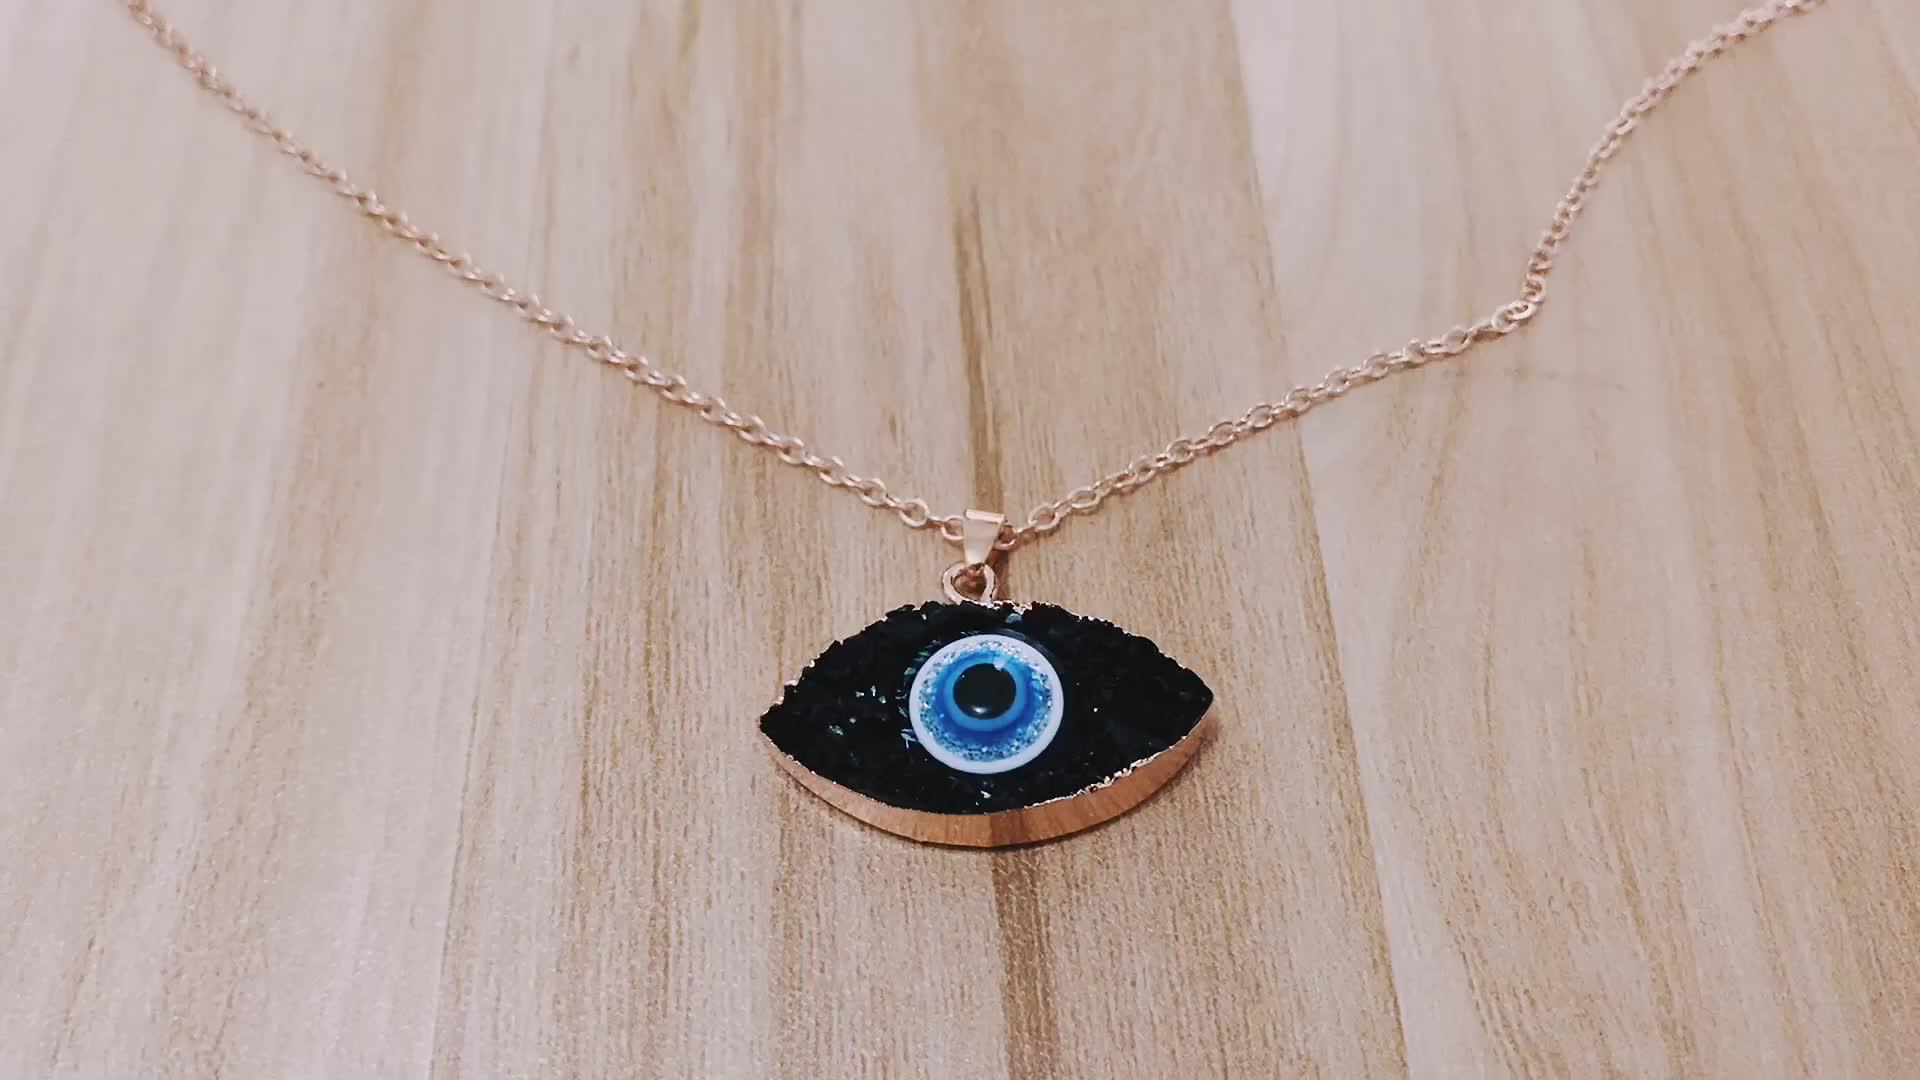 Free shipping 2019 fashion women necklace druzy quartz eye necklace